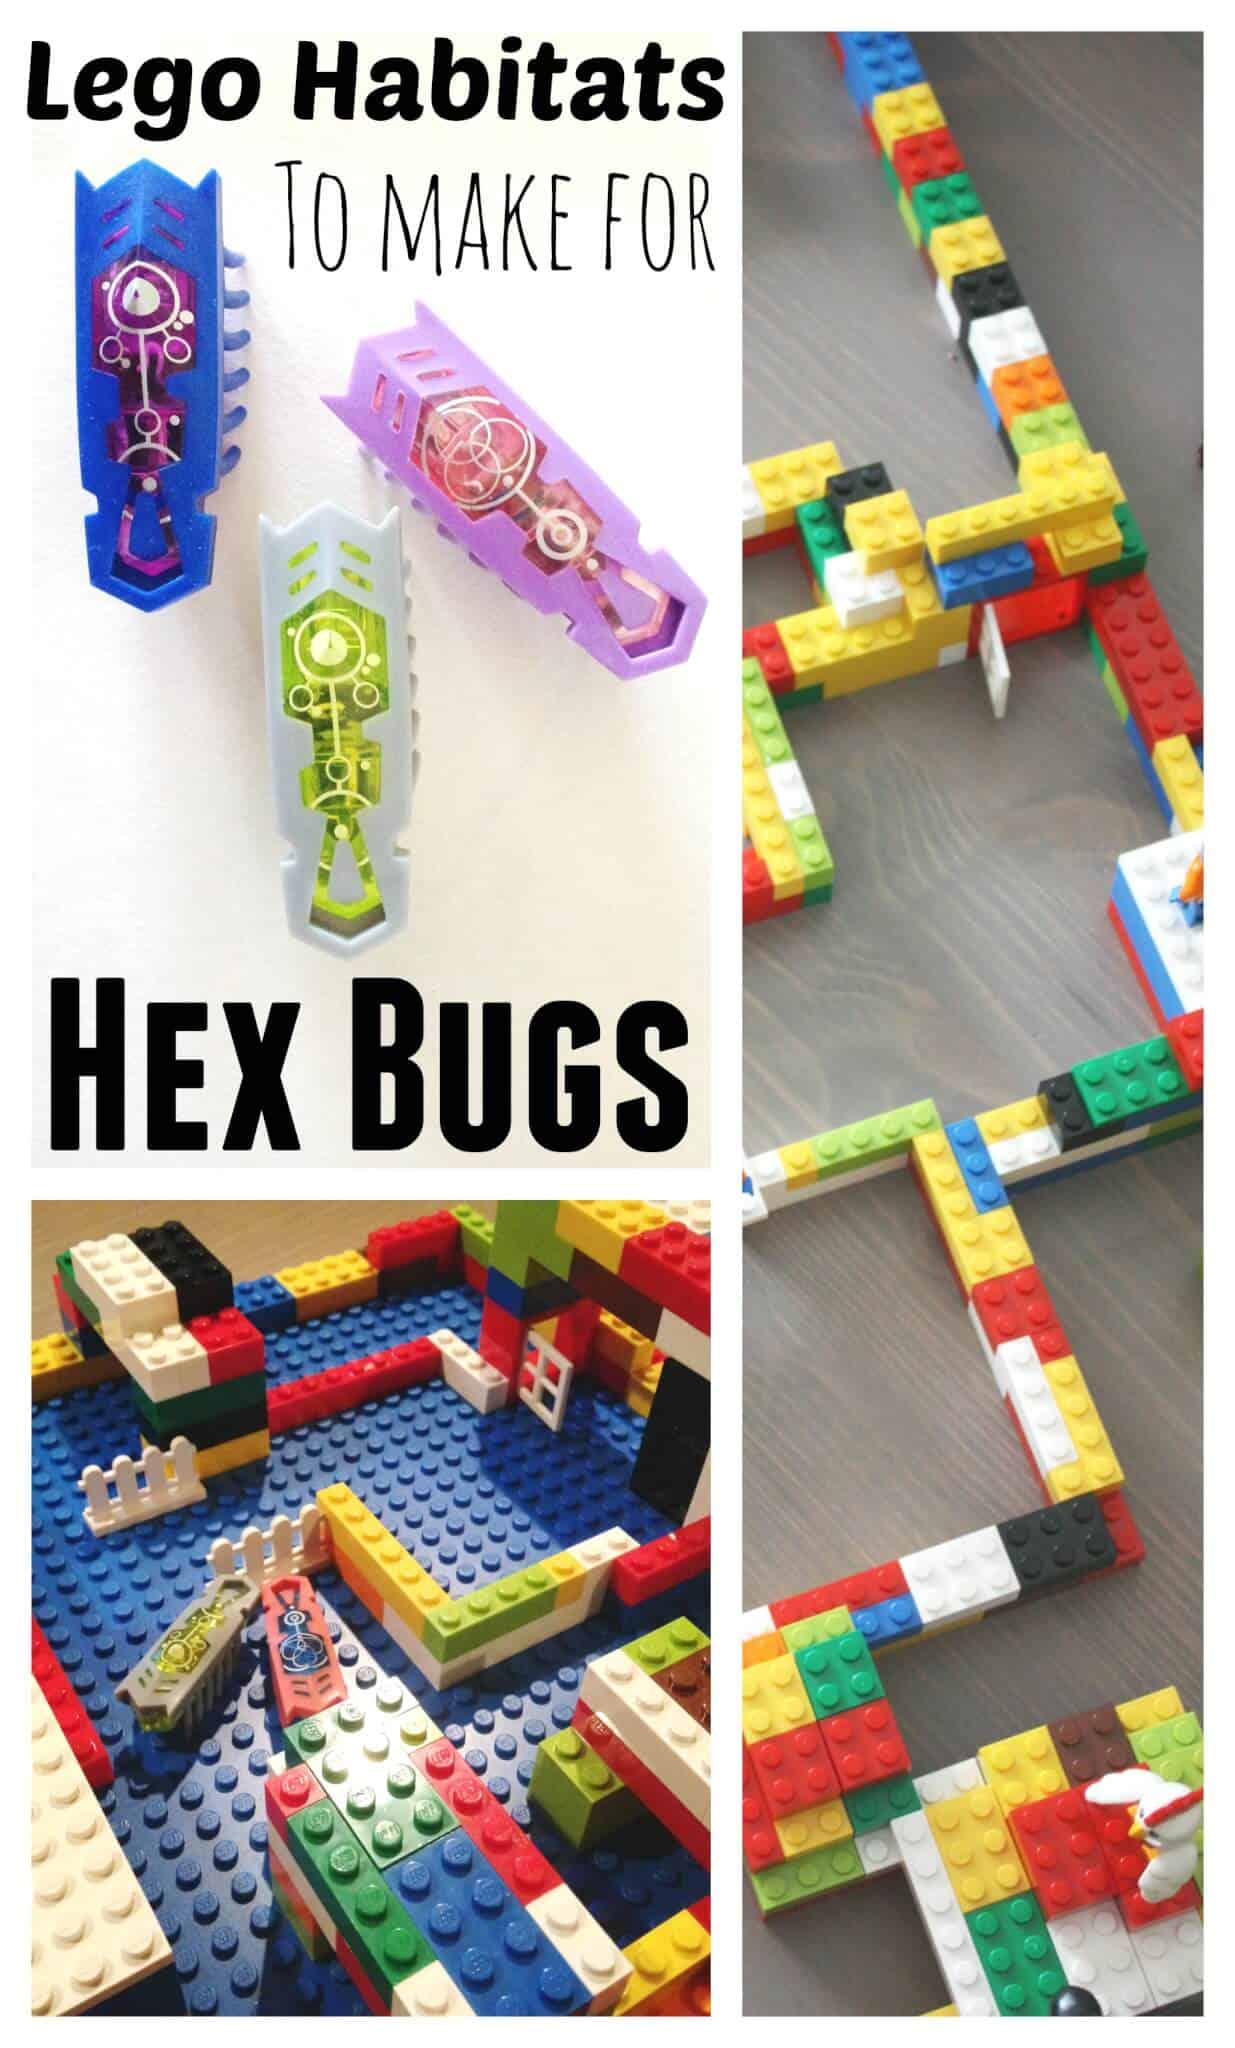 Hex Bugs Lego Habitat Building Ideas for Kids